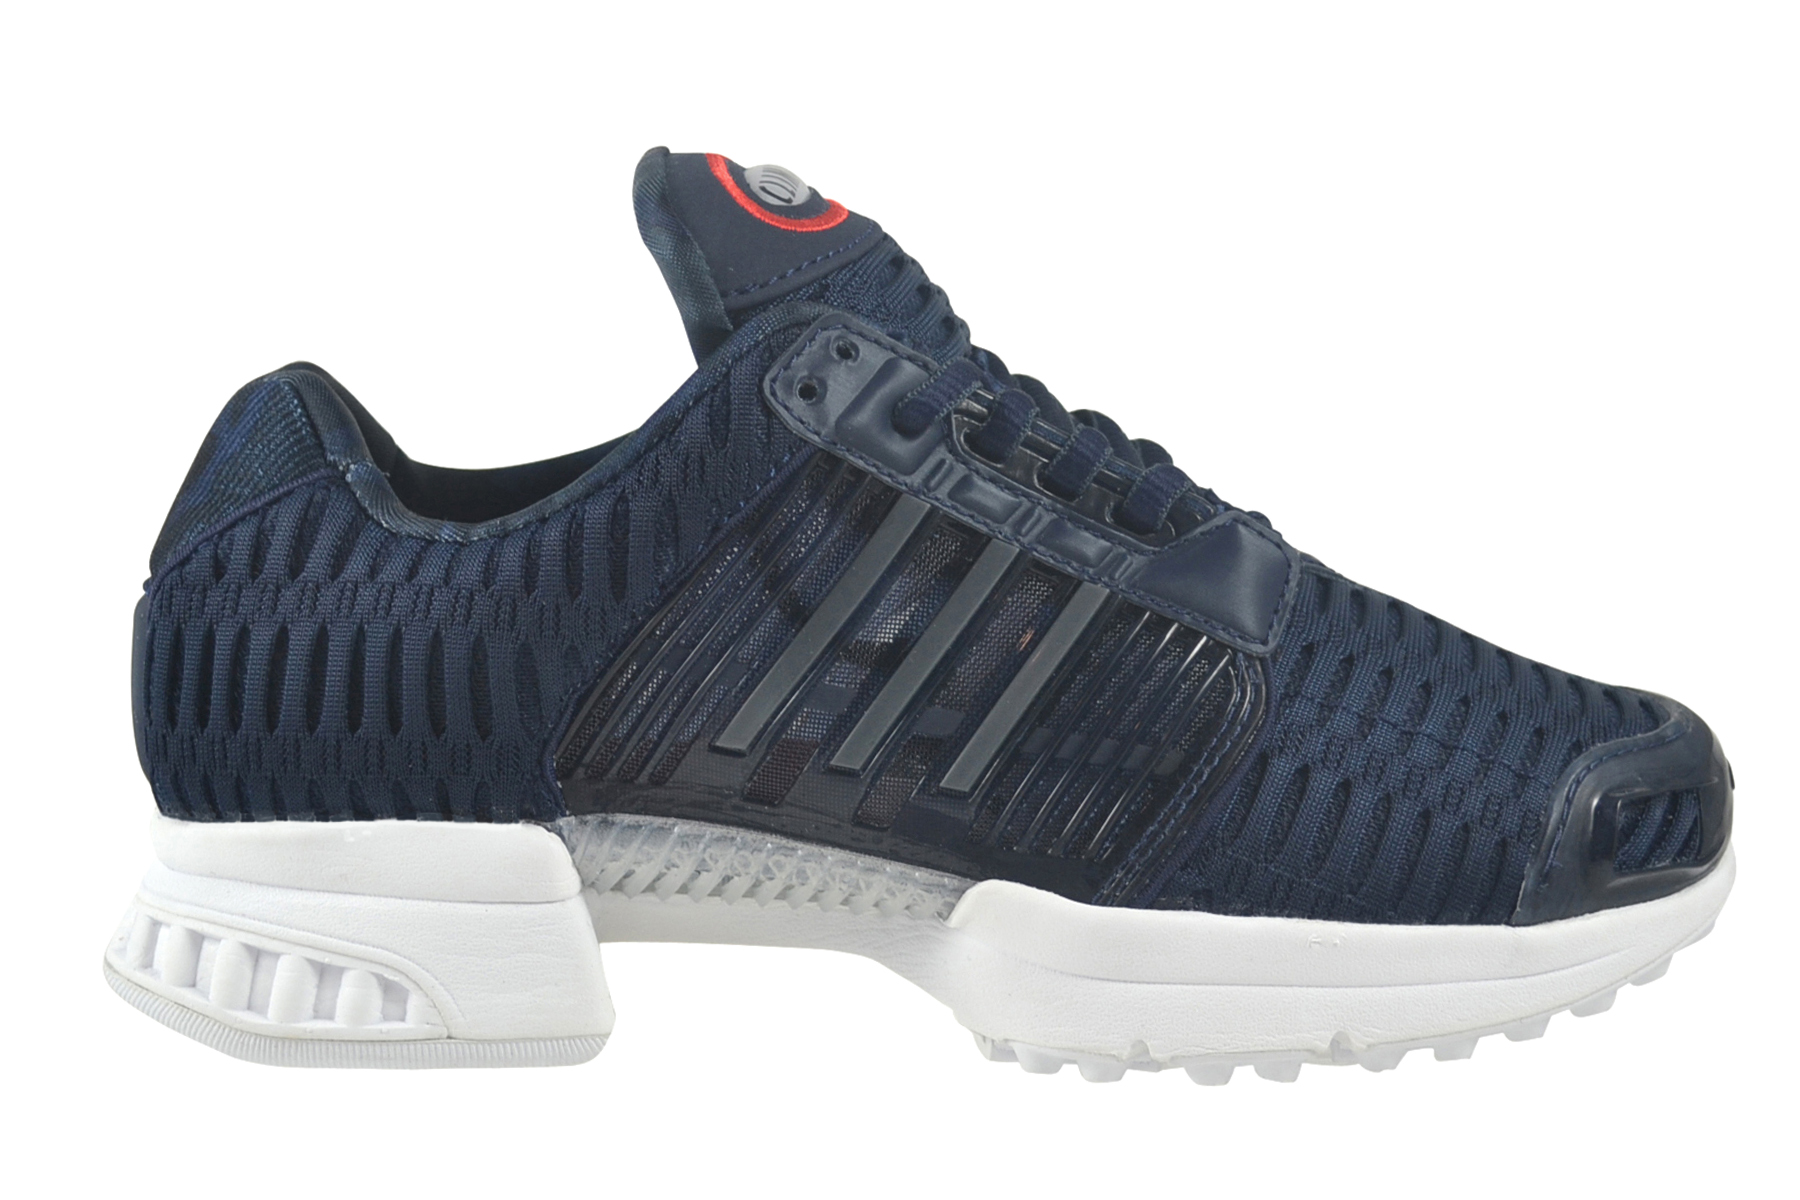 ADIDAS CLIMACOOL 1 Men Schuhe Herren Laufschuhe Sneaker